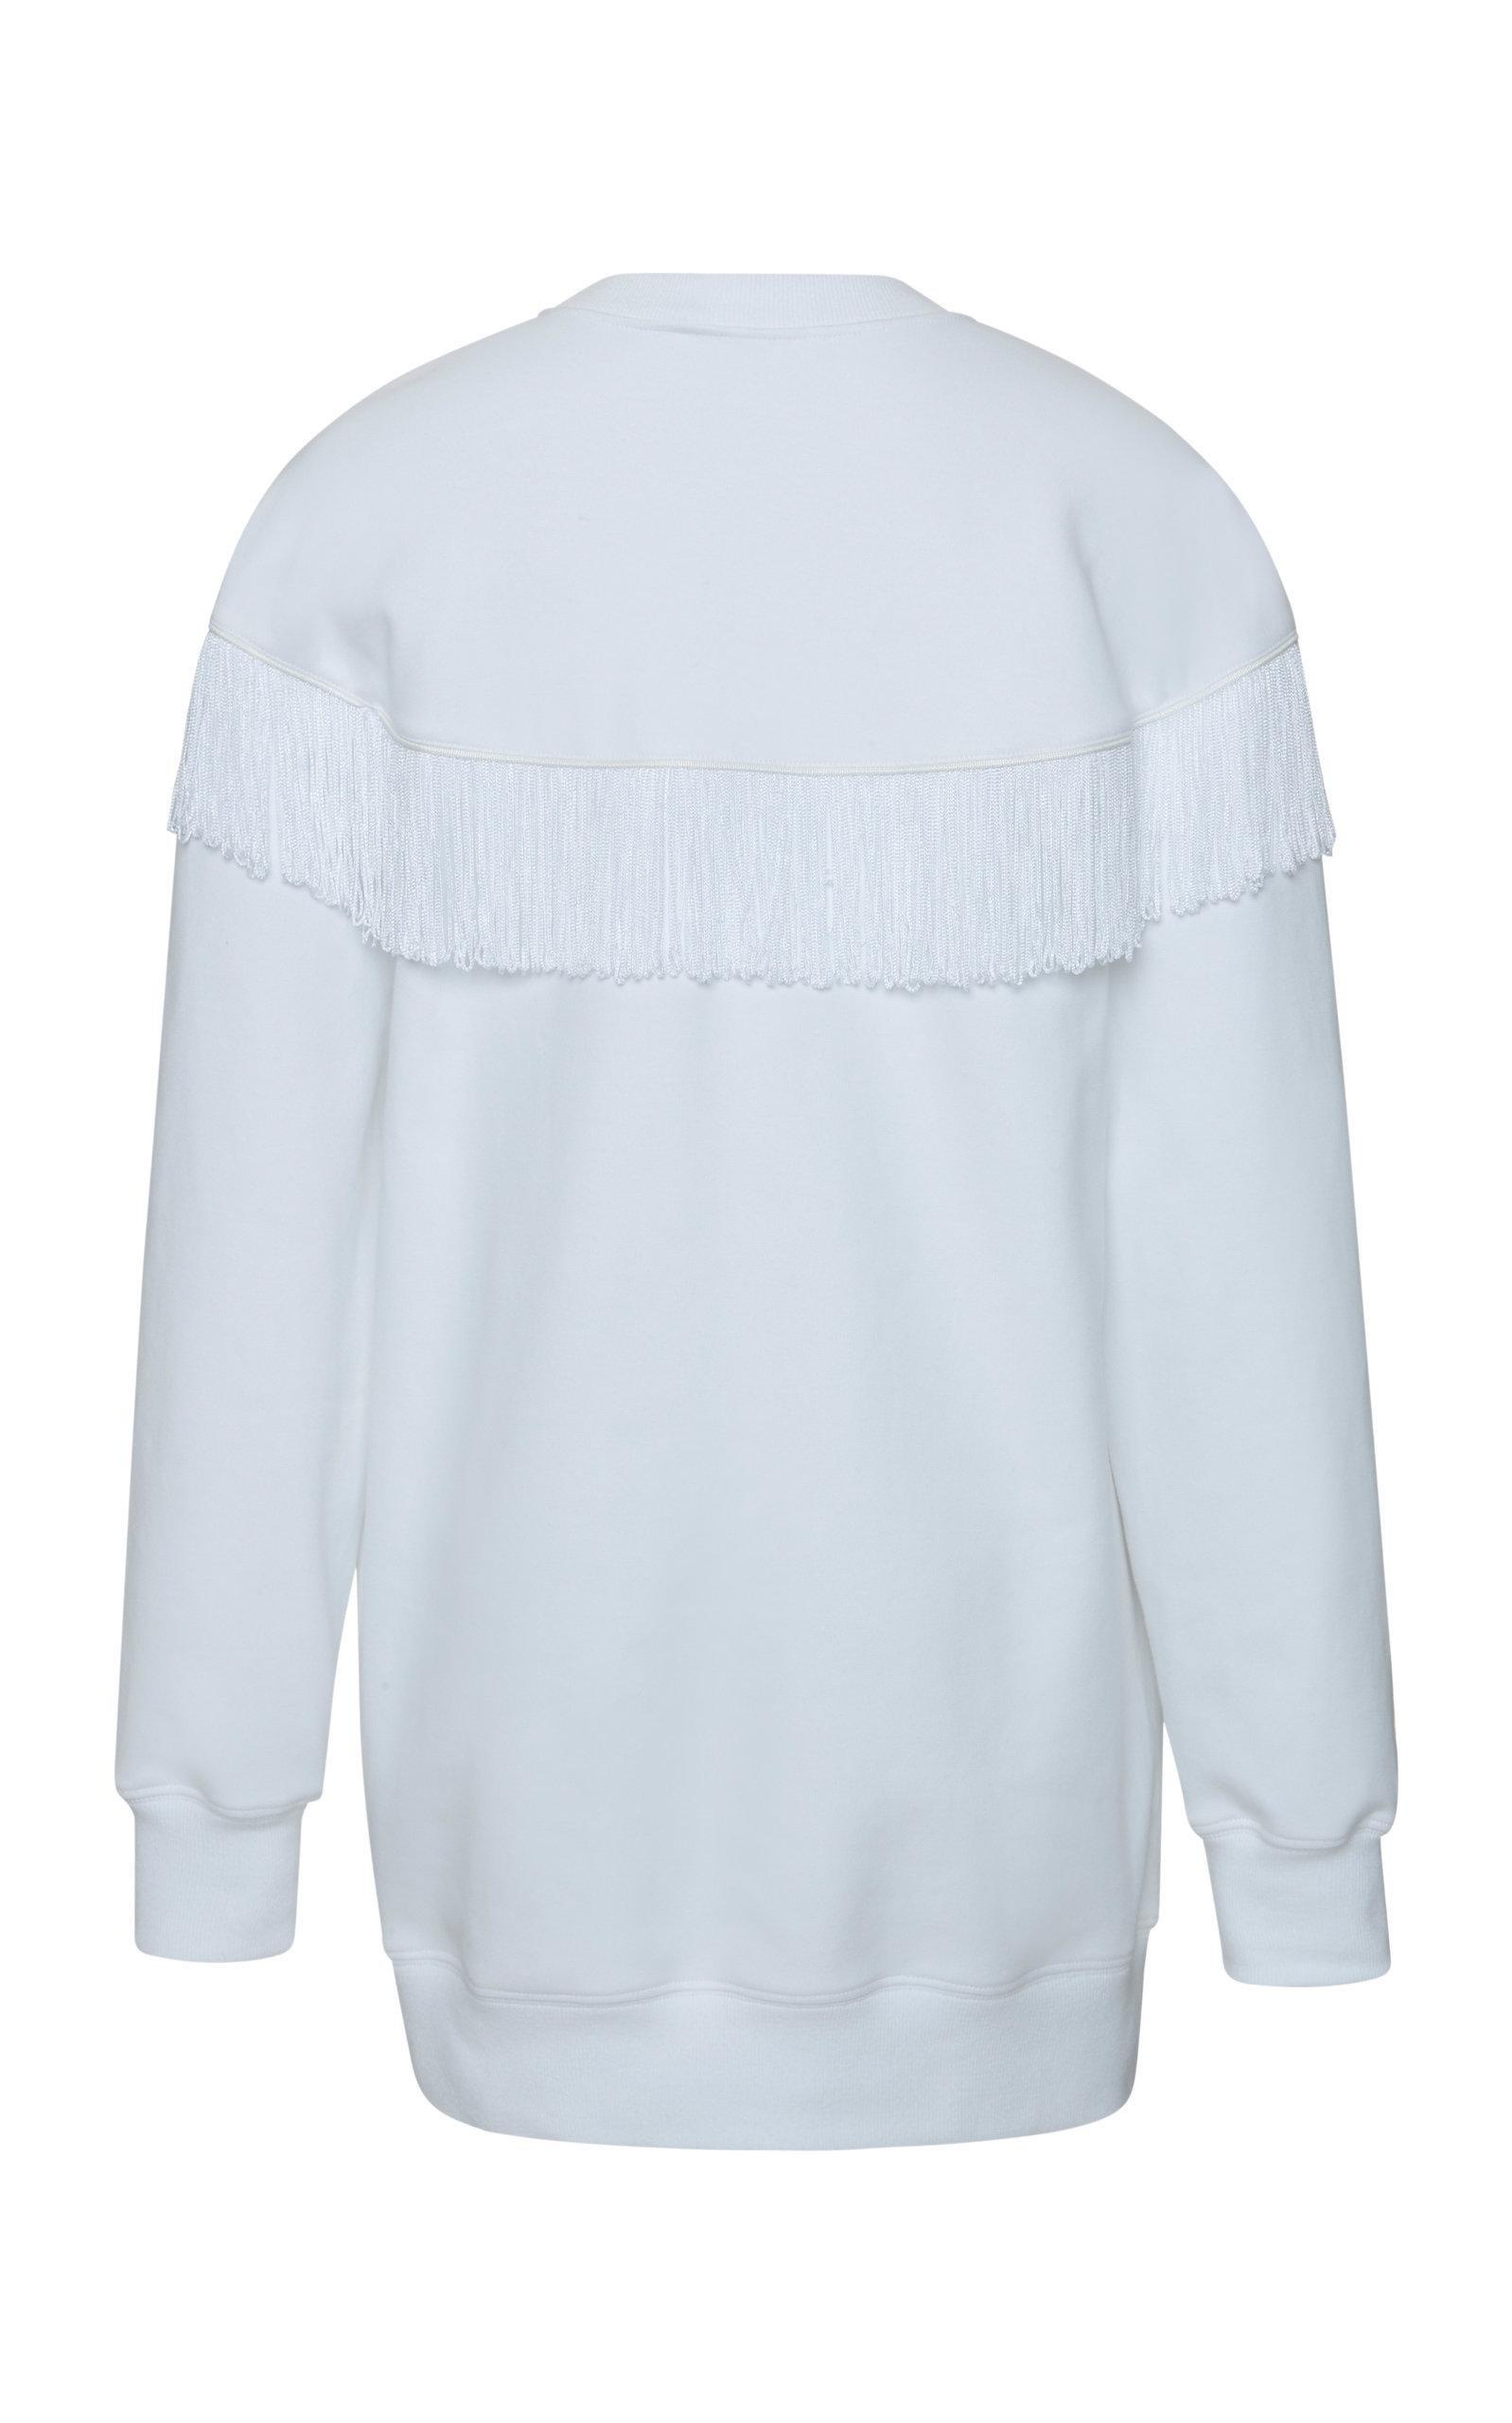 Gorizia Crewneck Sweatshirt Vivetta Pick A Best Sale Online Natural And Freely Huge Surprise Cheap Online Enjoy Sale Online FPm8rIDKFL